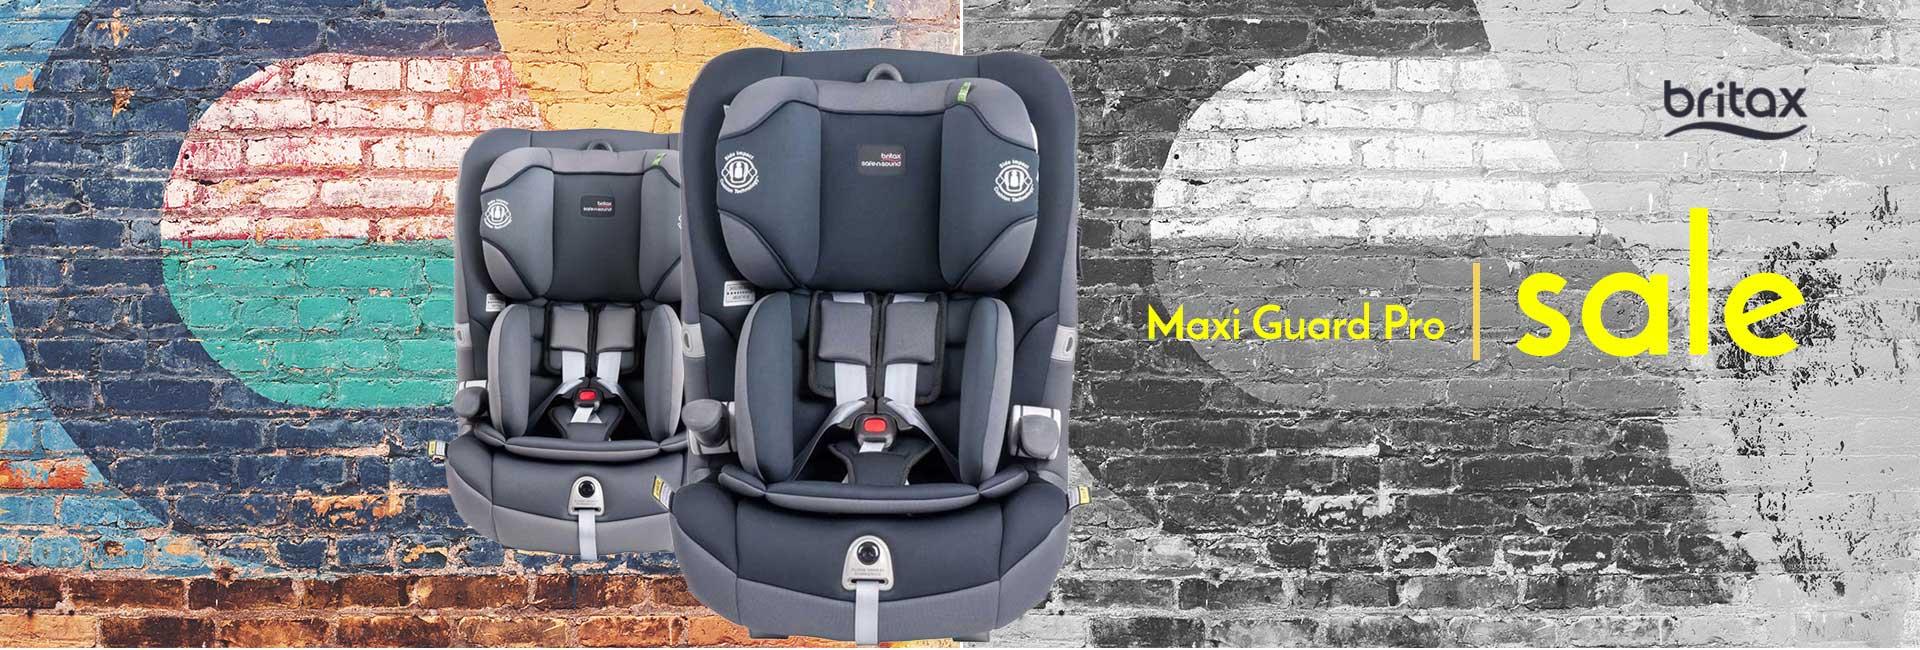 Maxi Guard Pro Sale